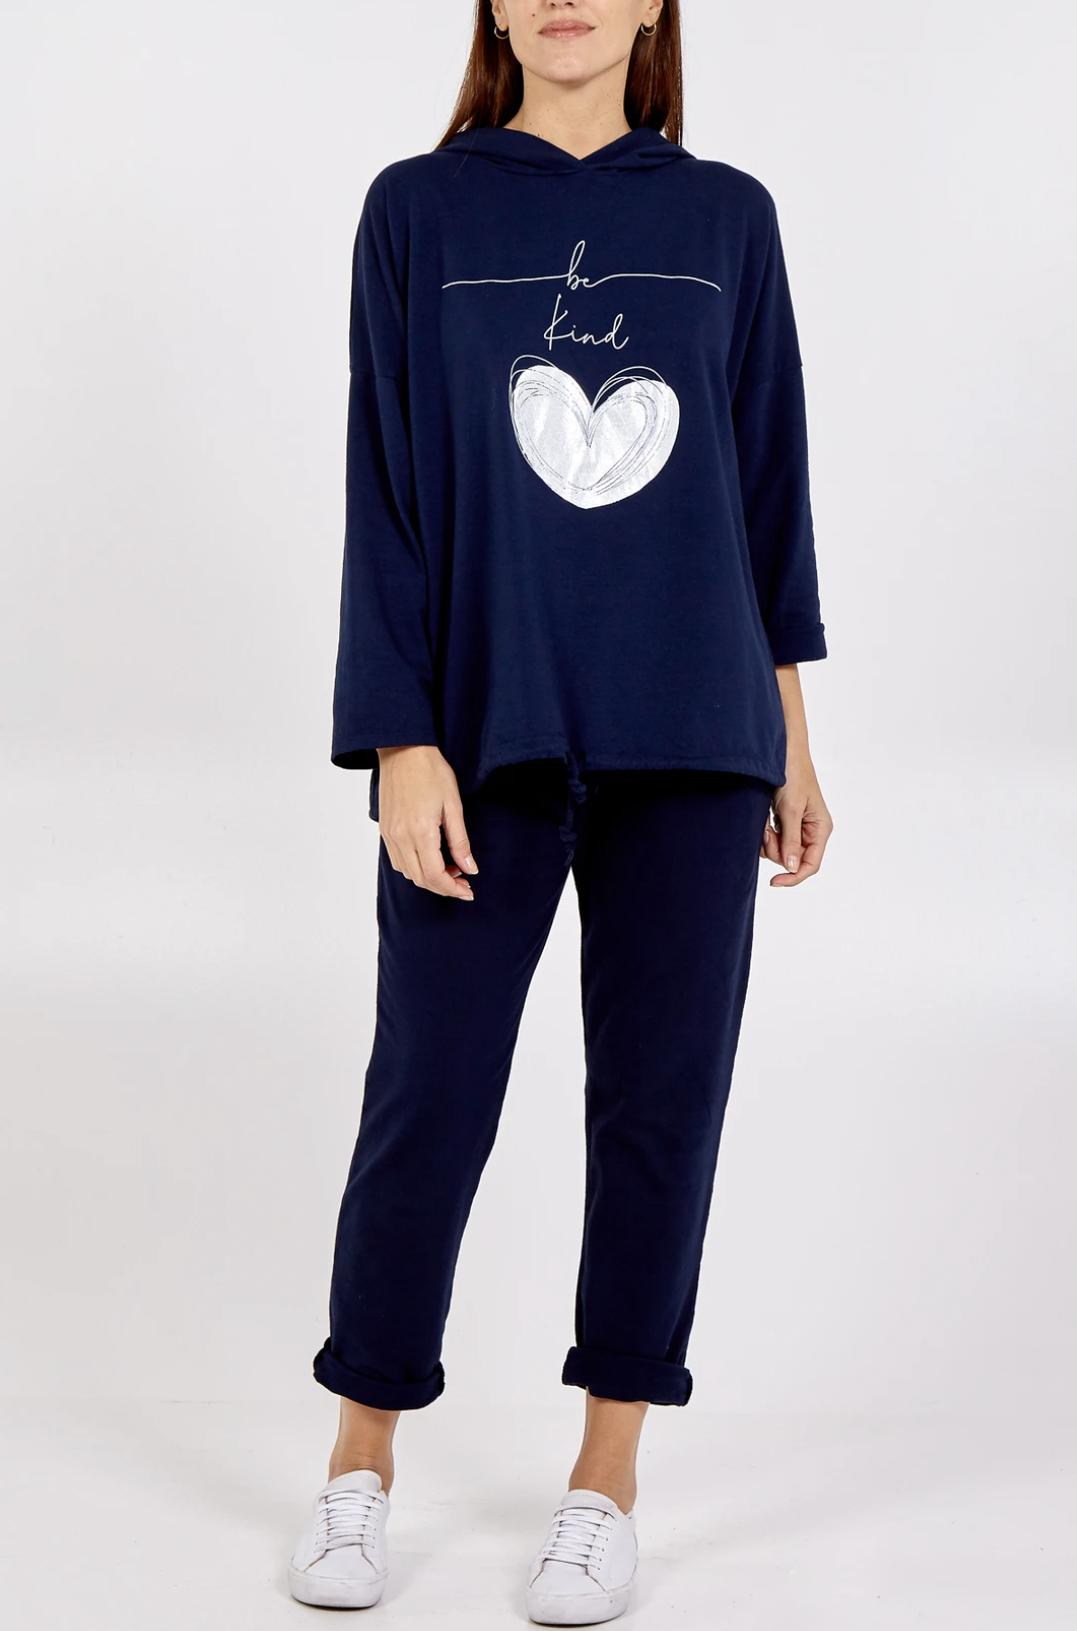 Be Kind - Hooded Sweatshirt & Jogger Set